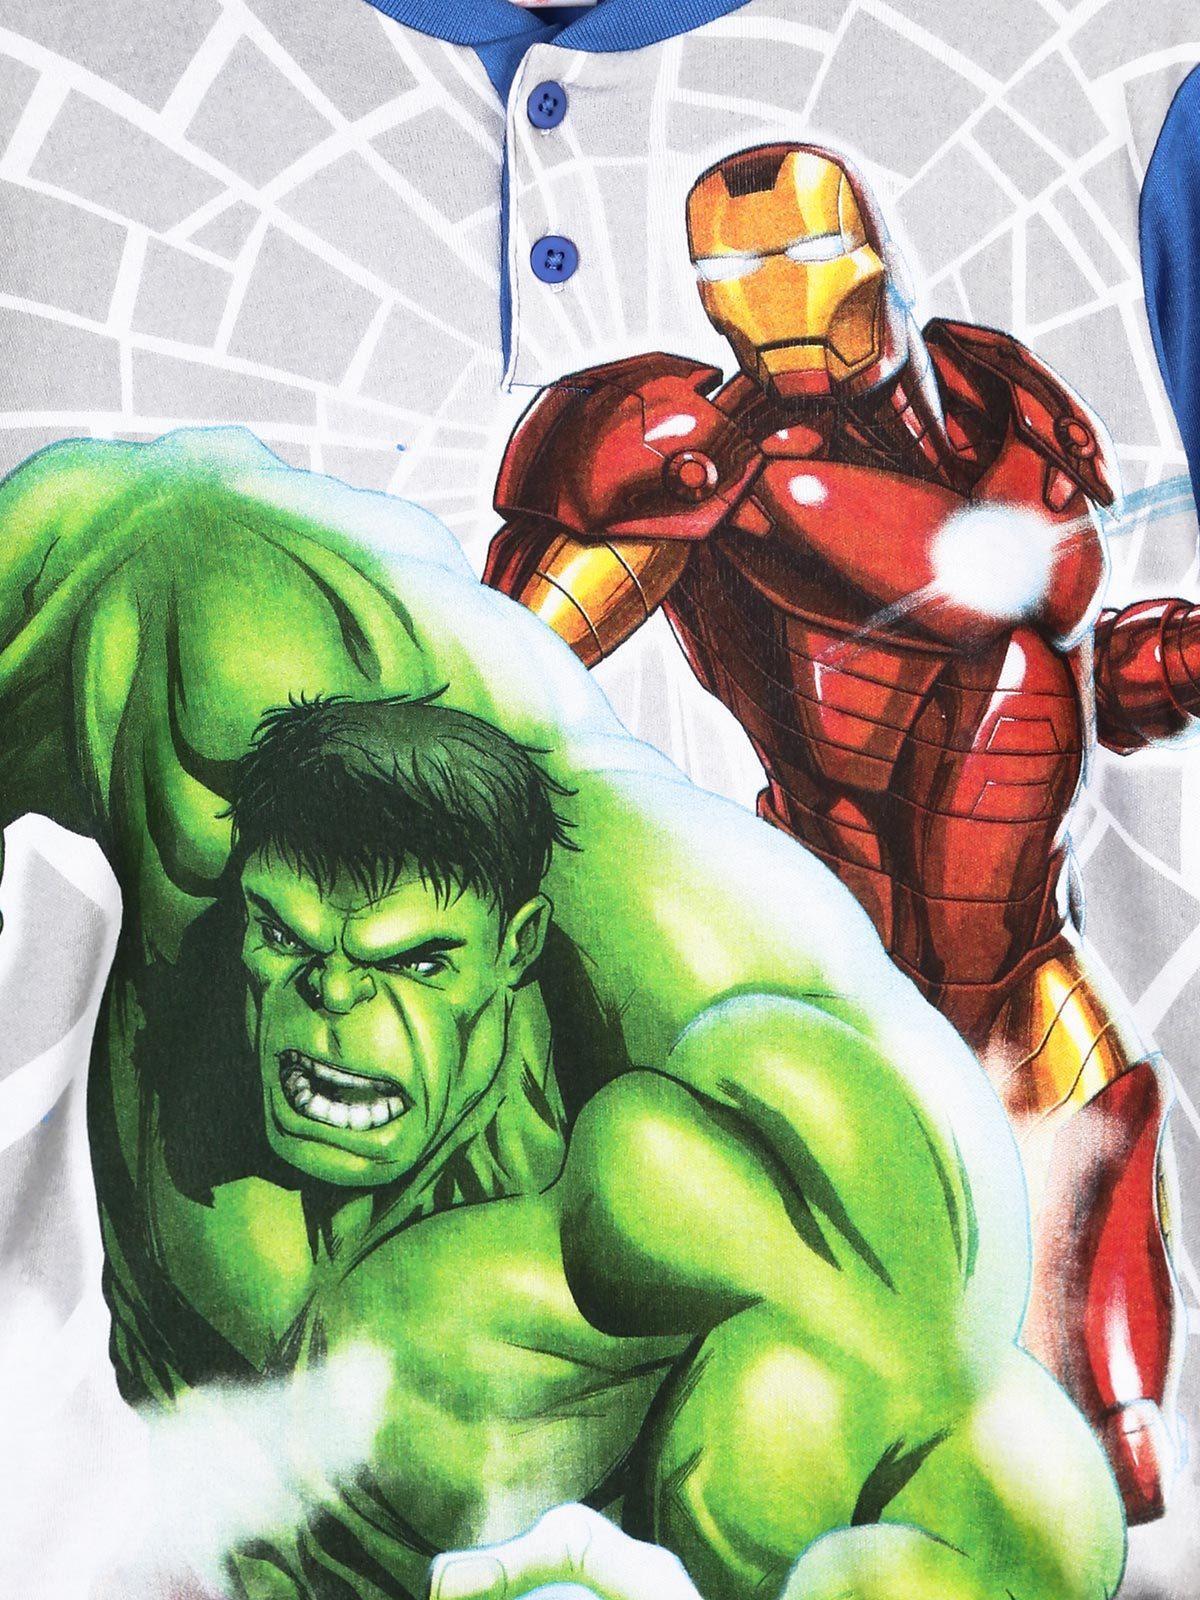 marvel Cotton pajamas with hulk and iron man print | MecShopping